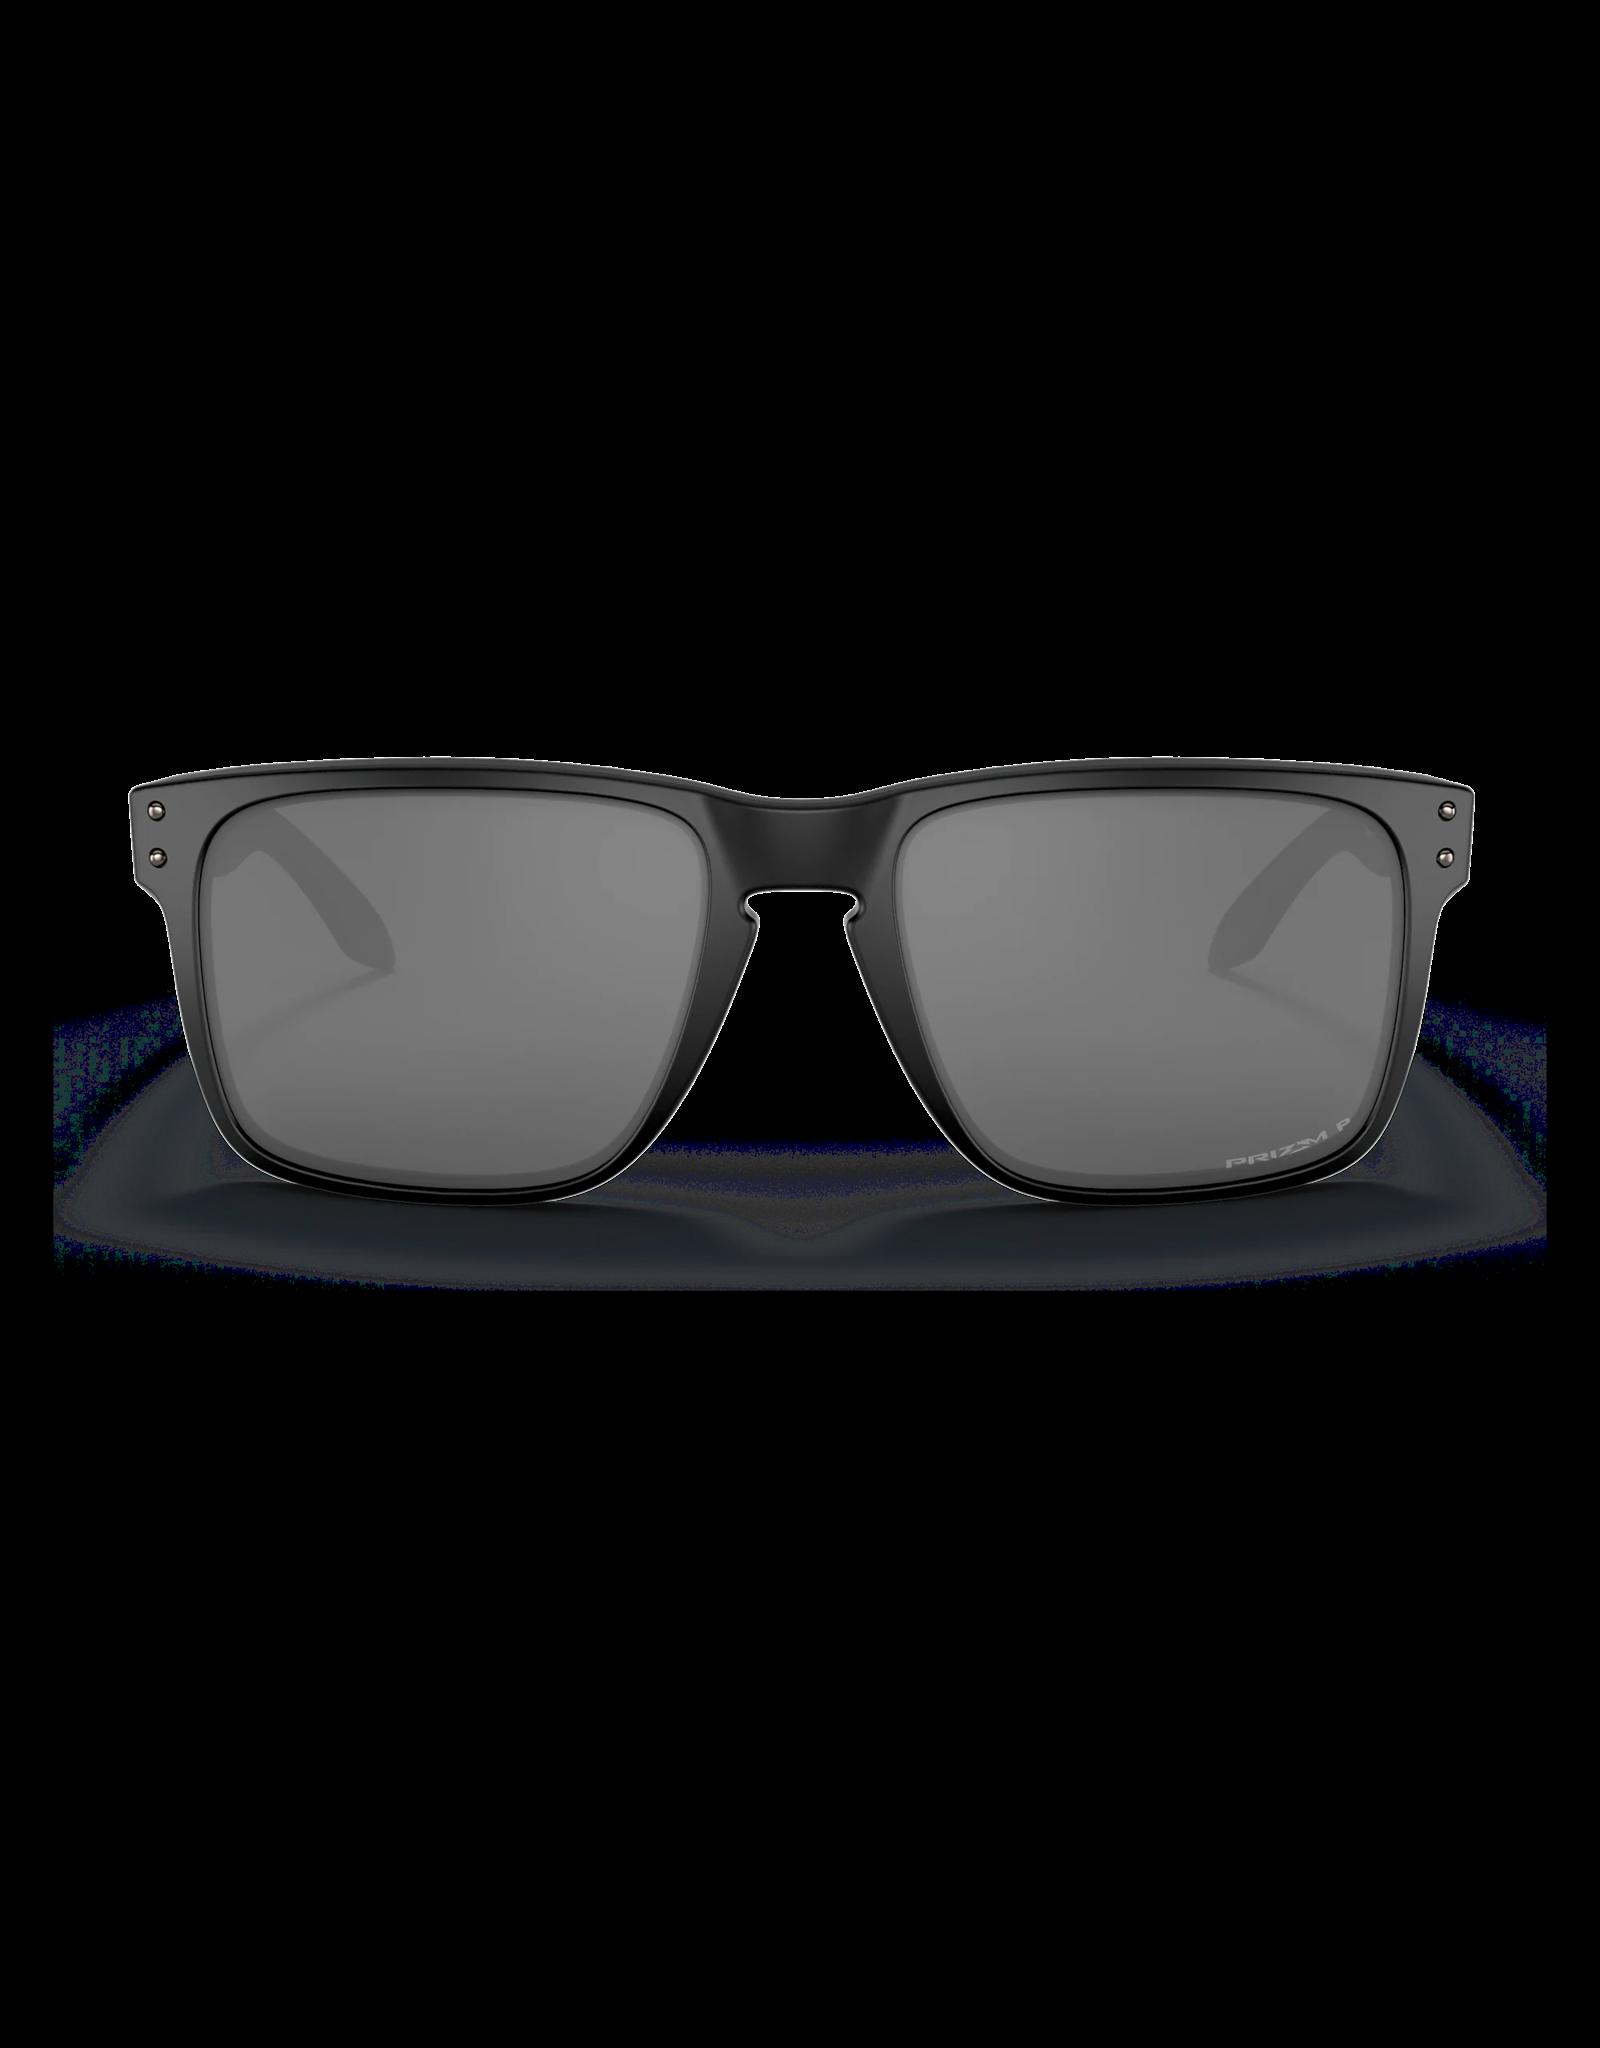 OAKLEY Oakley Holbrook XL matte noir prizm noir polarised sunglasses